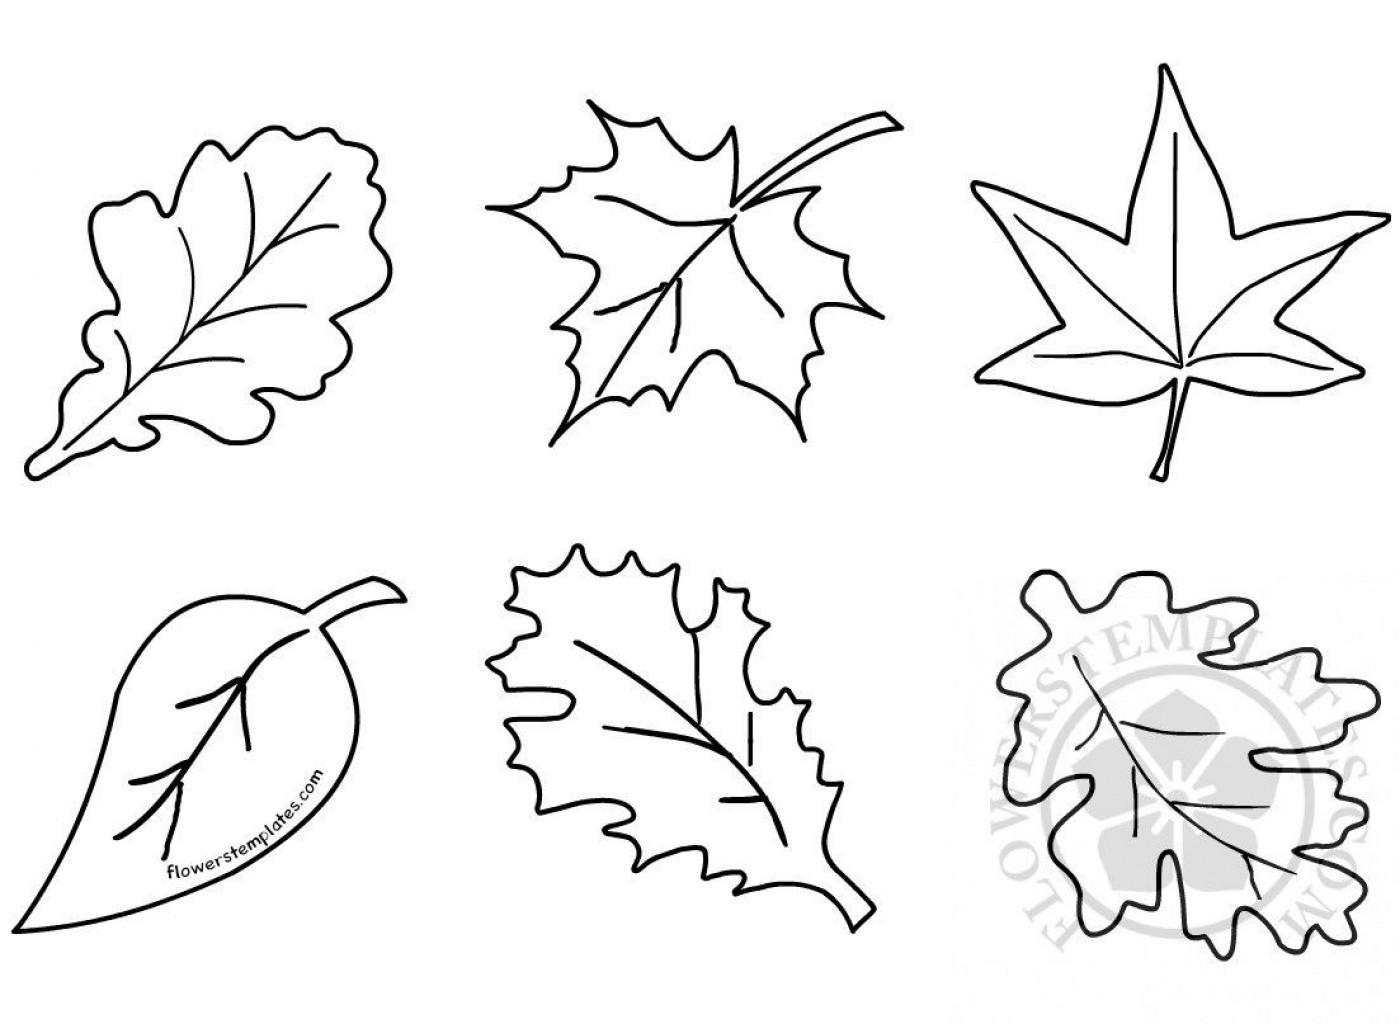 011 Formidable Blank Leaf Template With Line Idea  Printable1400